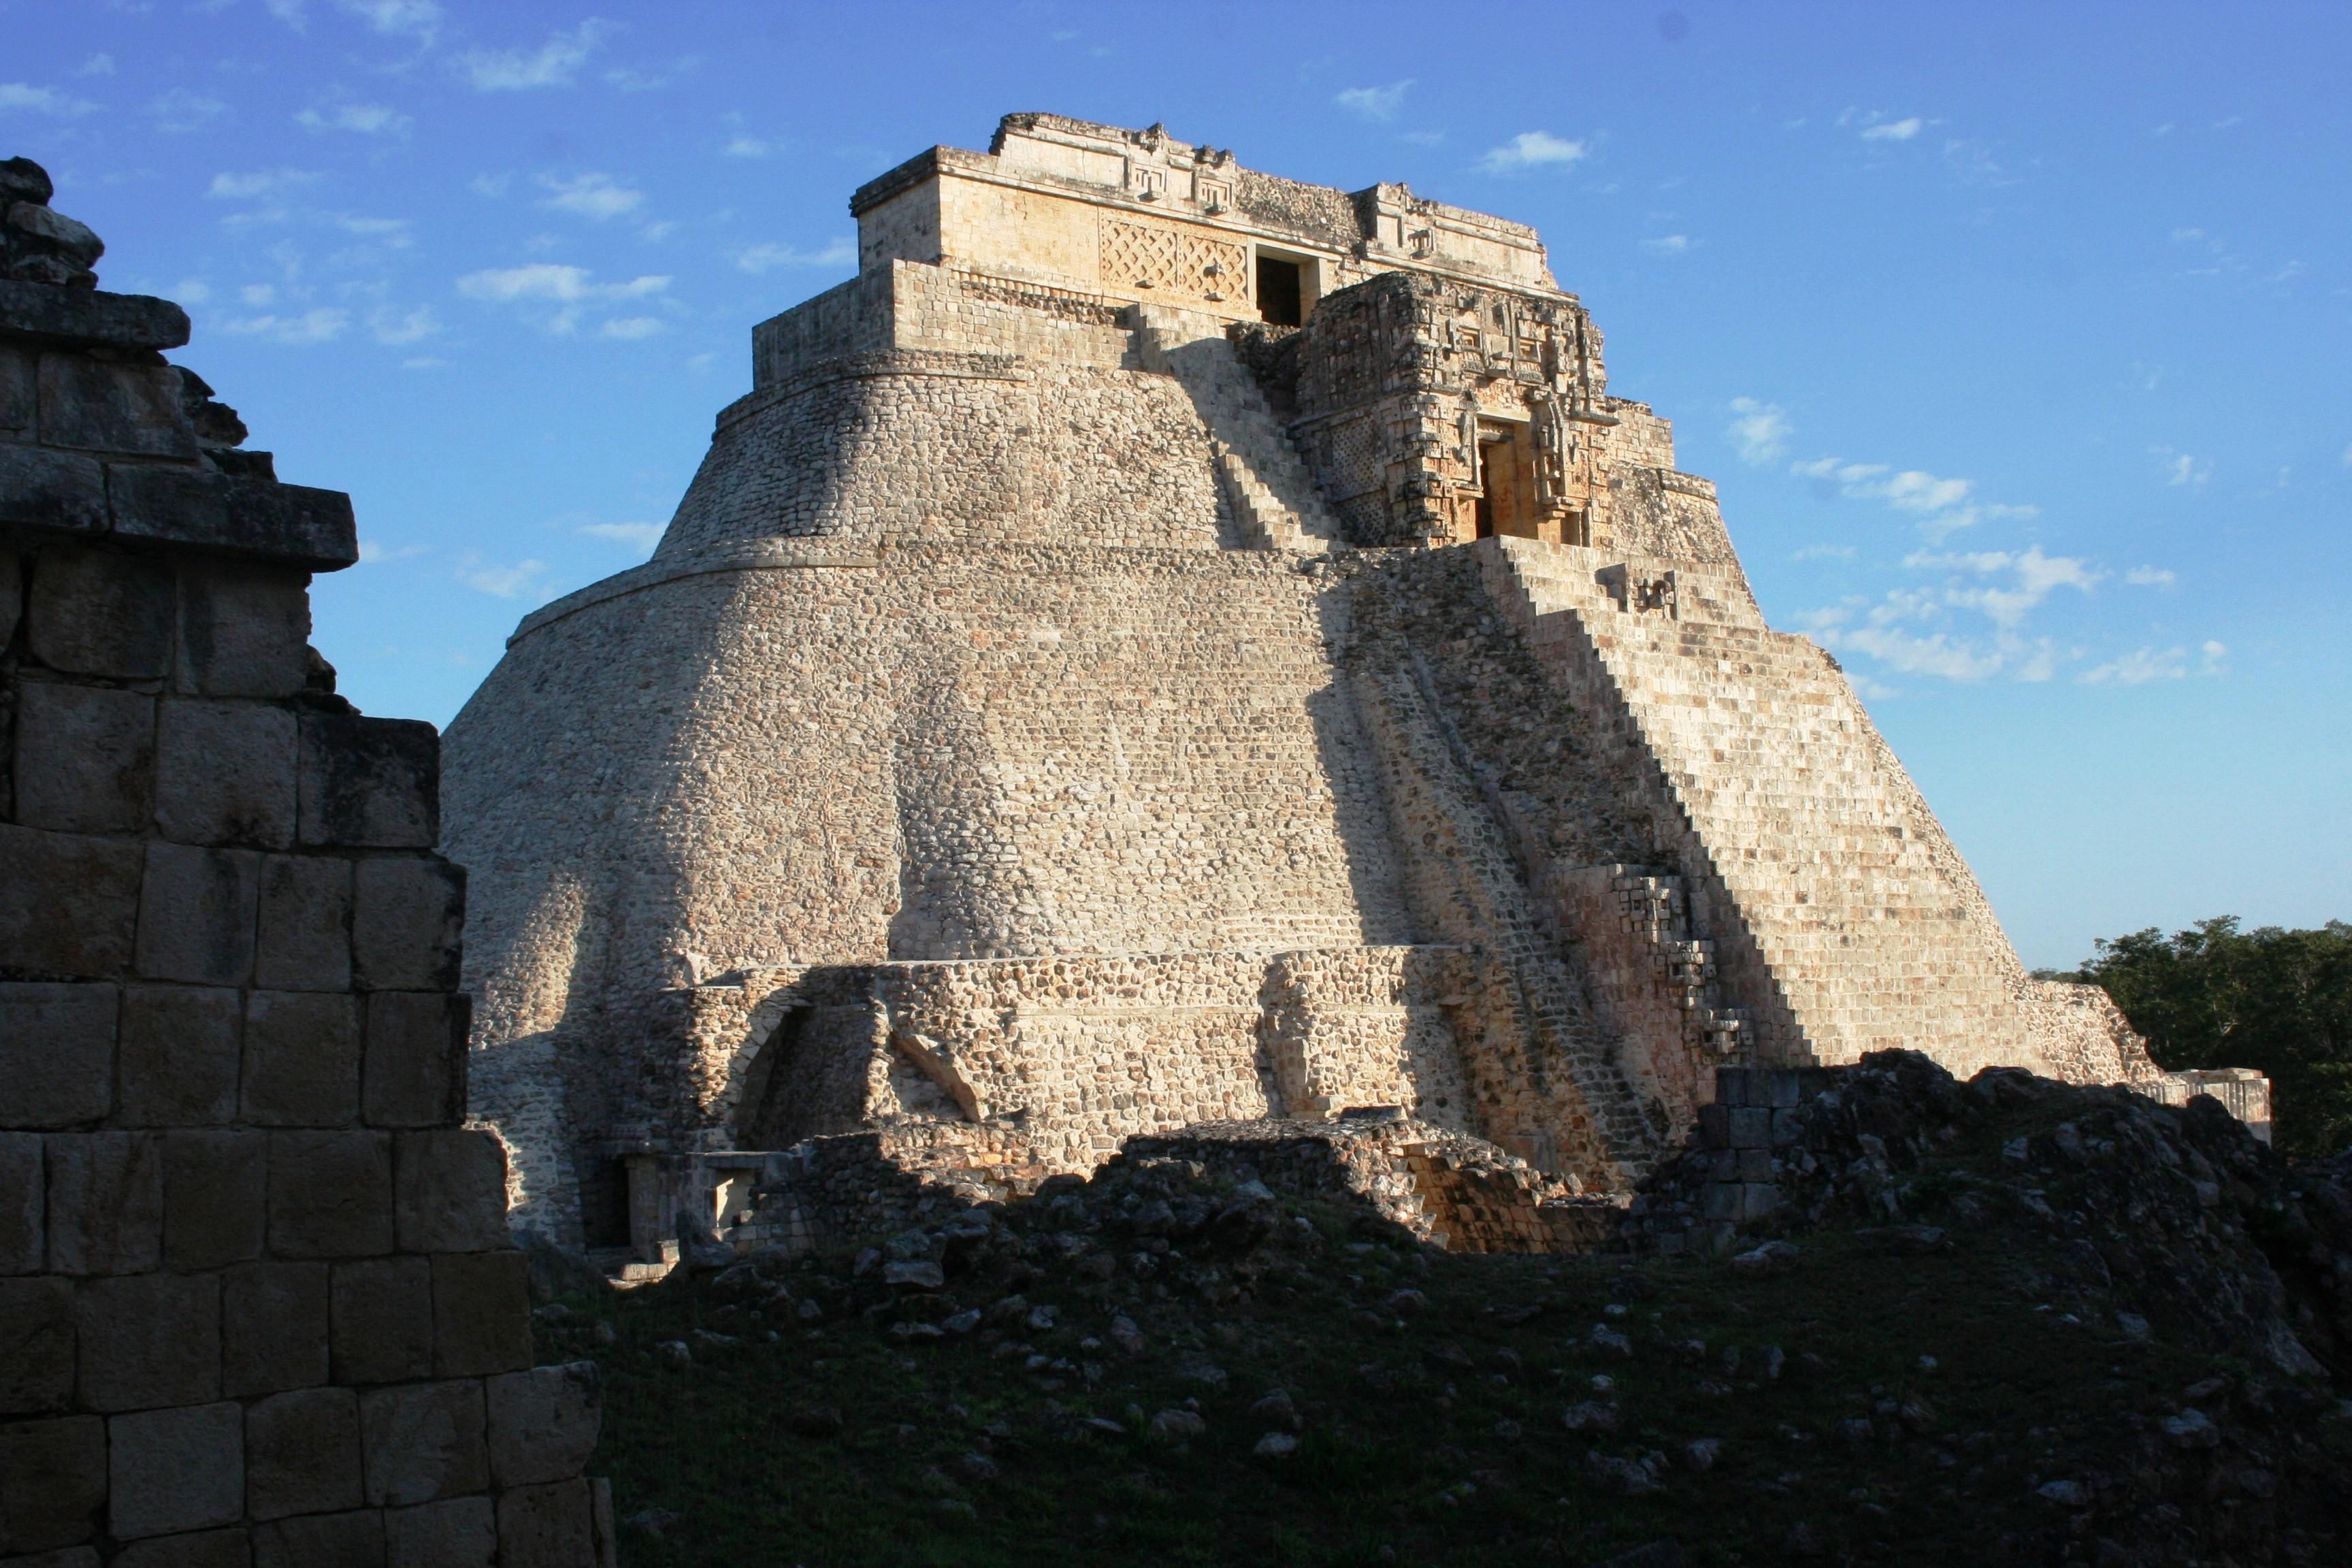 Uxmal Pyramid of the Magician